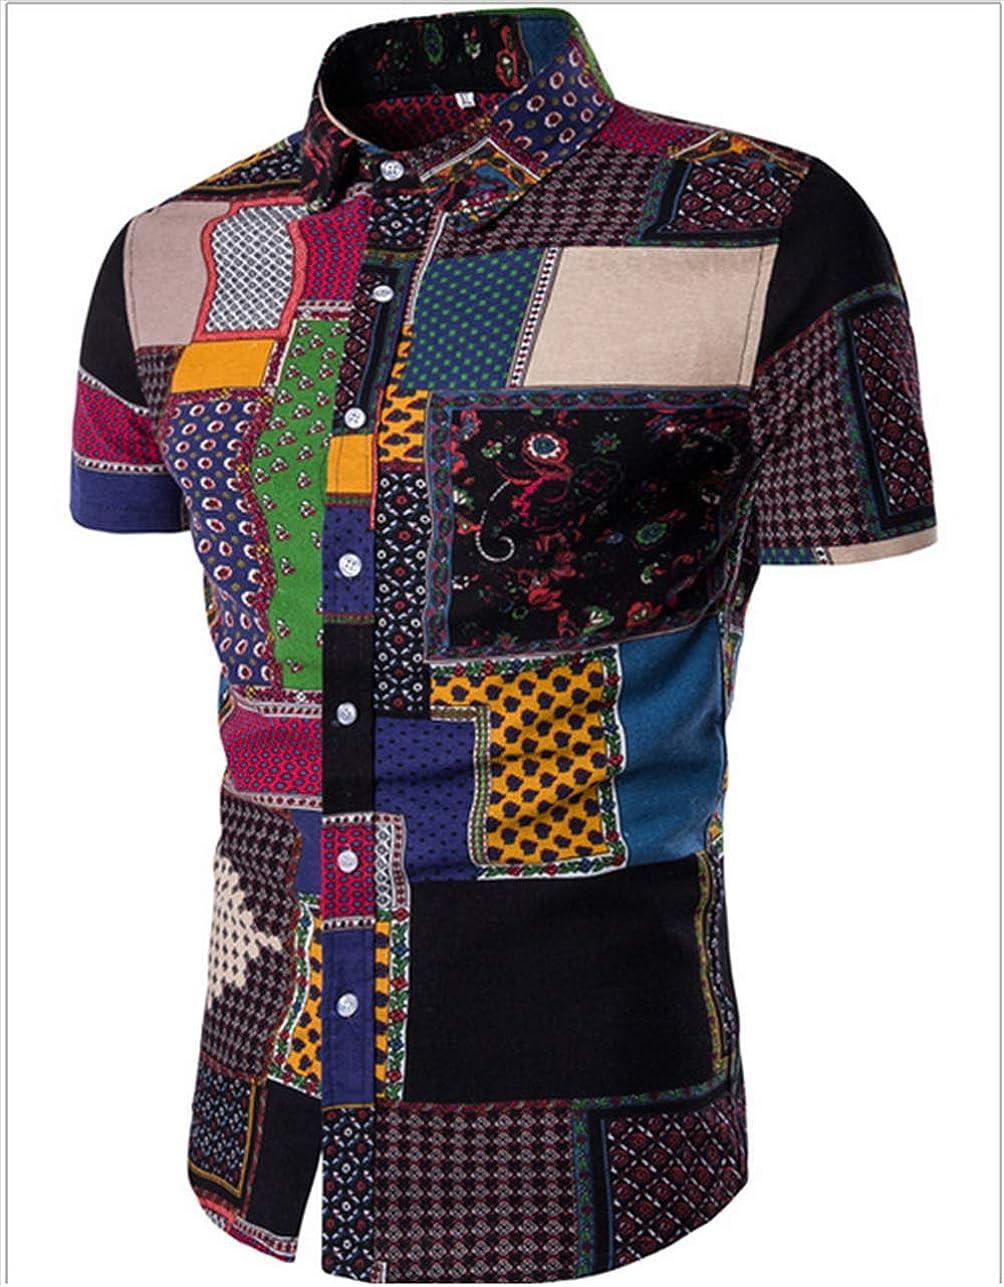 Hawaiian Shirts for Men Button Down Short Sleeve Shirt Aloha Linen Printing Shirt,12 Styles